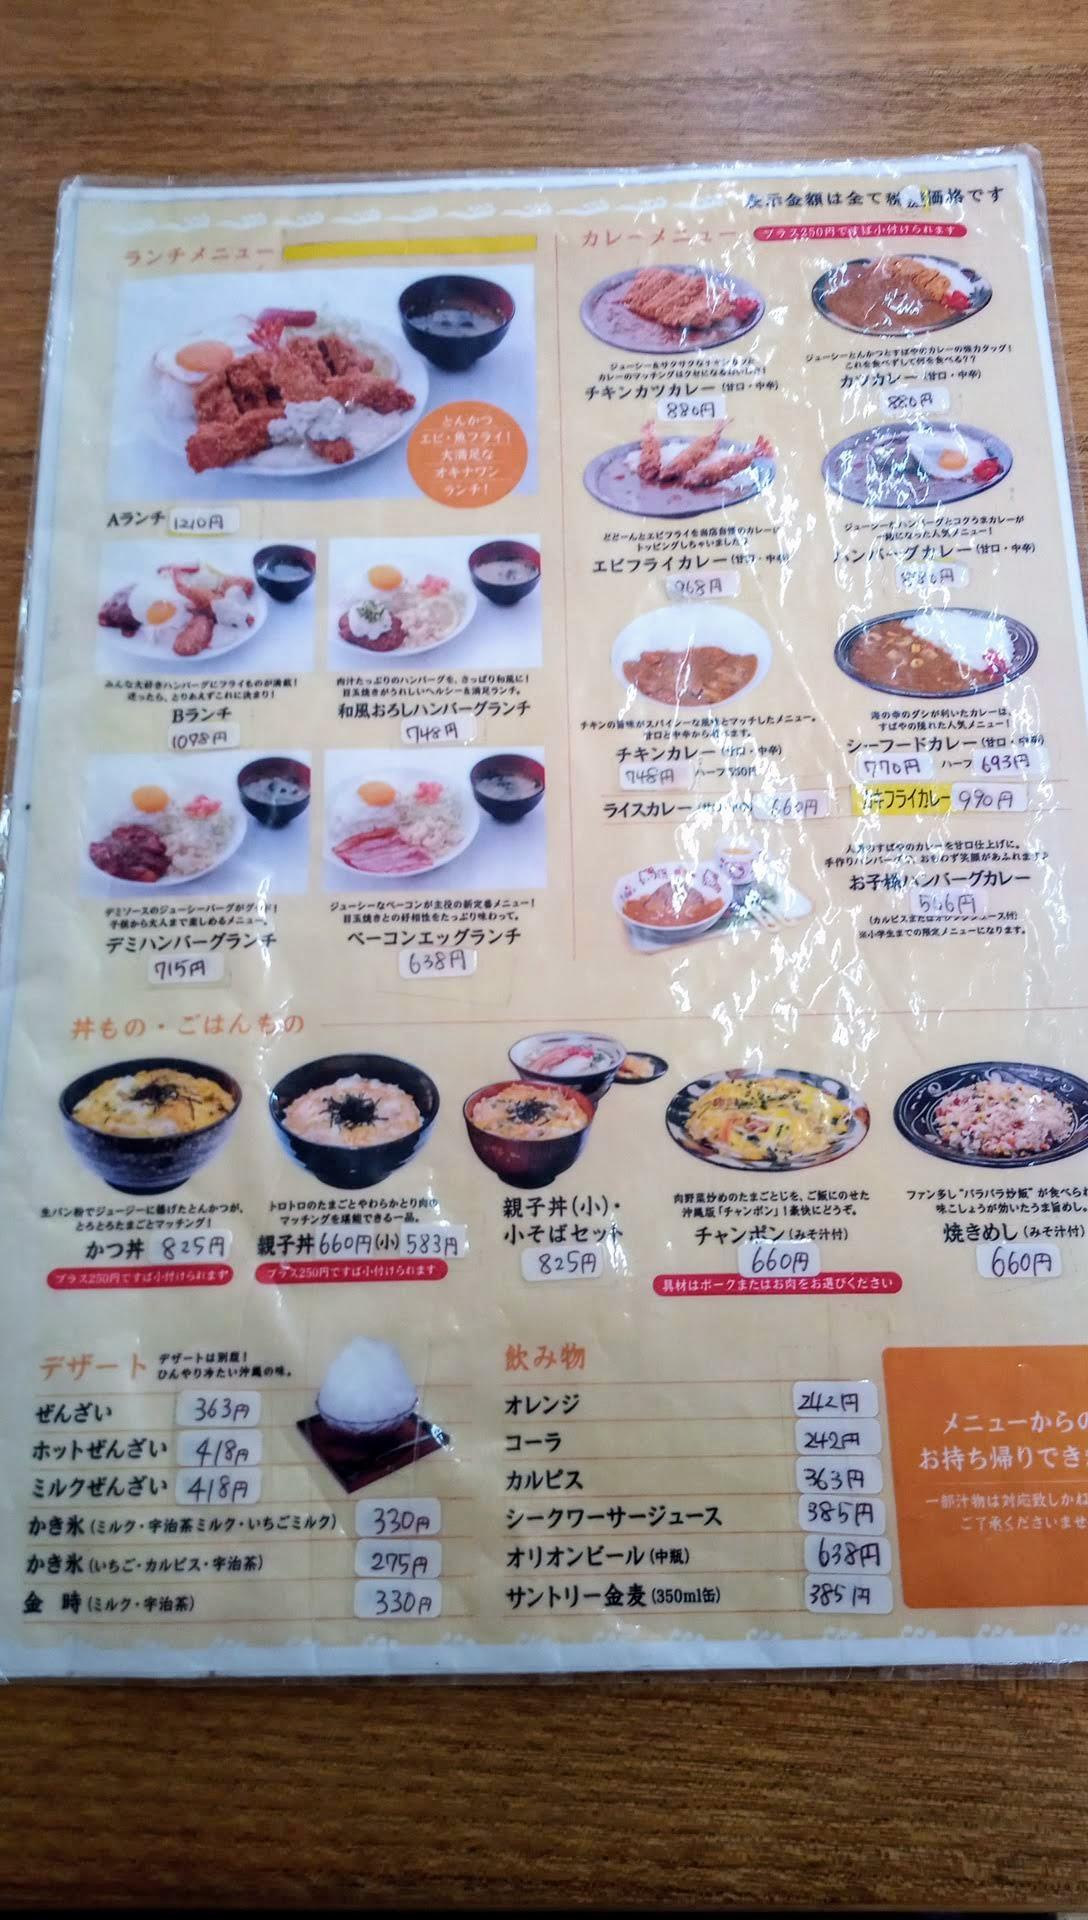 the menu of Umichika Shokudo 3